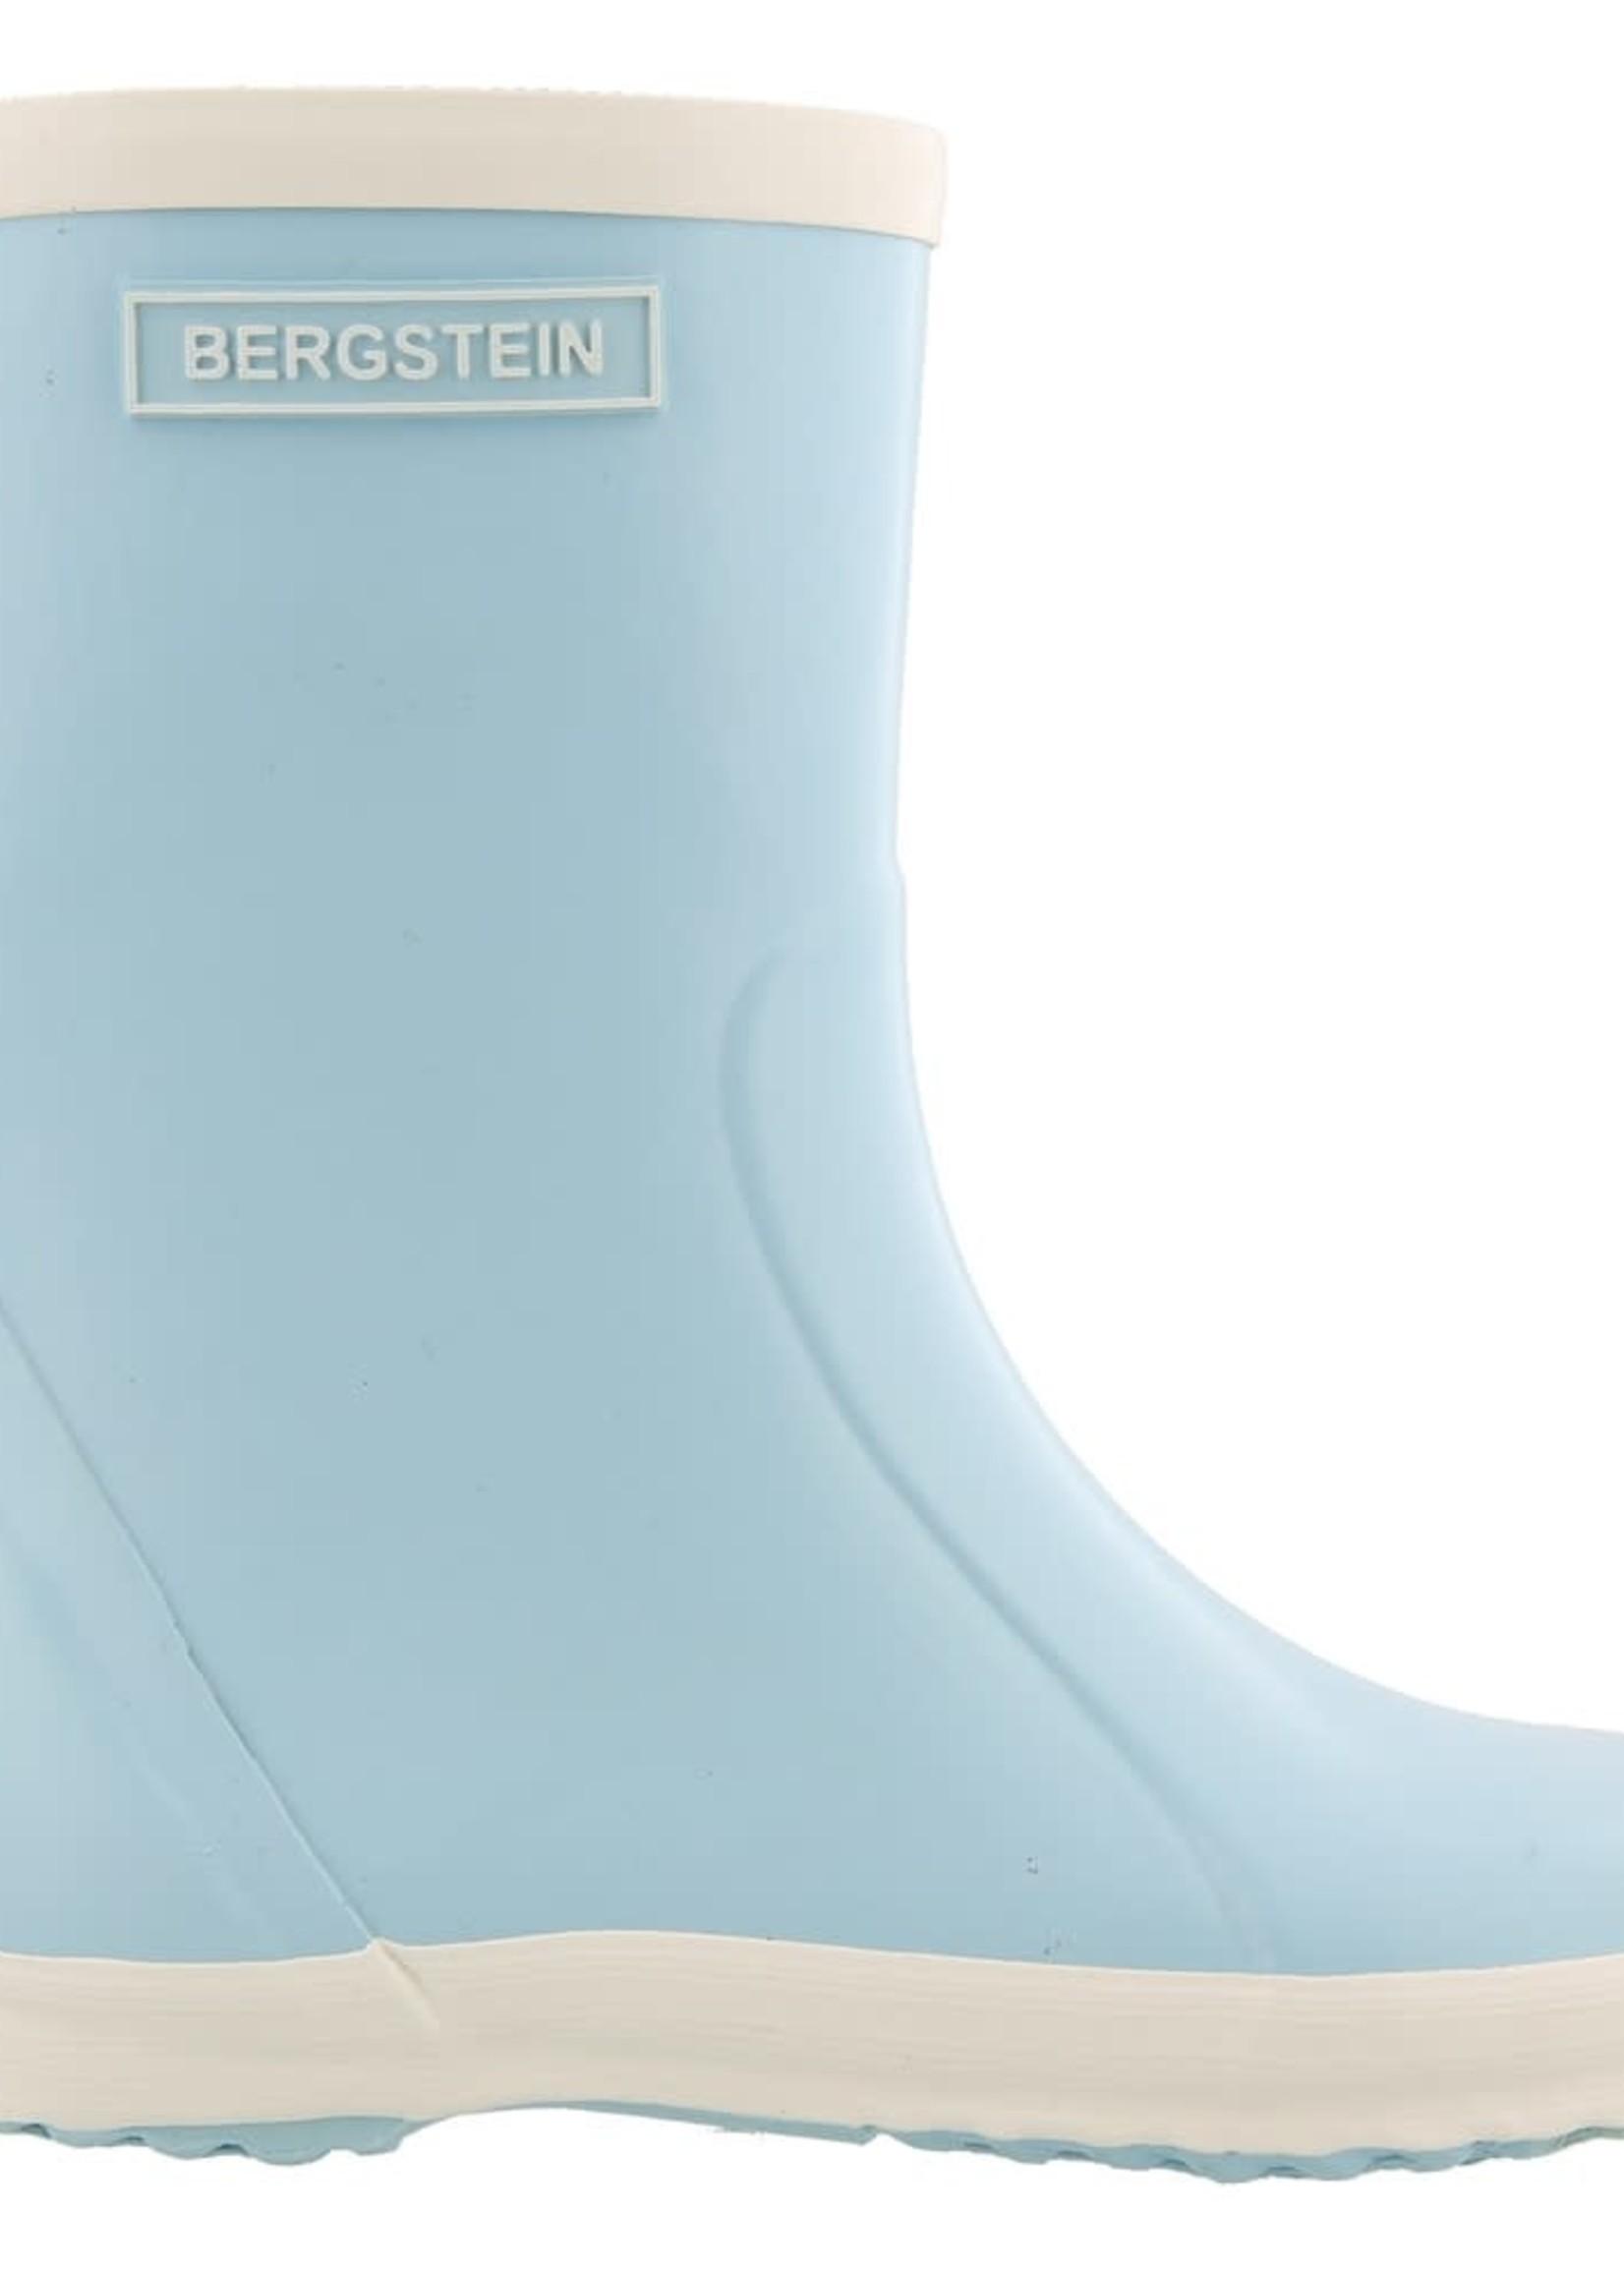 Bergstein Bergstein - Celeste